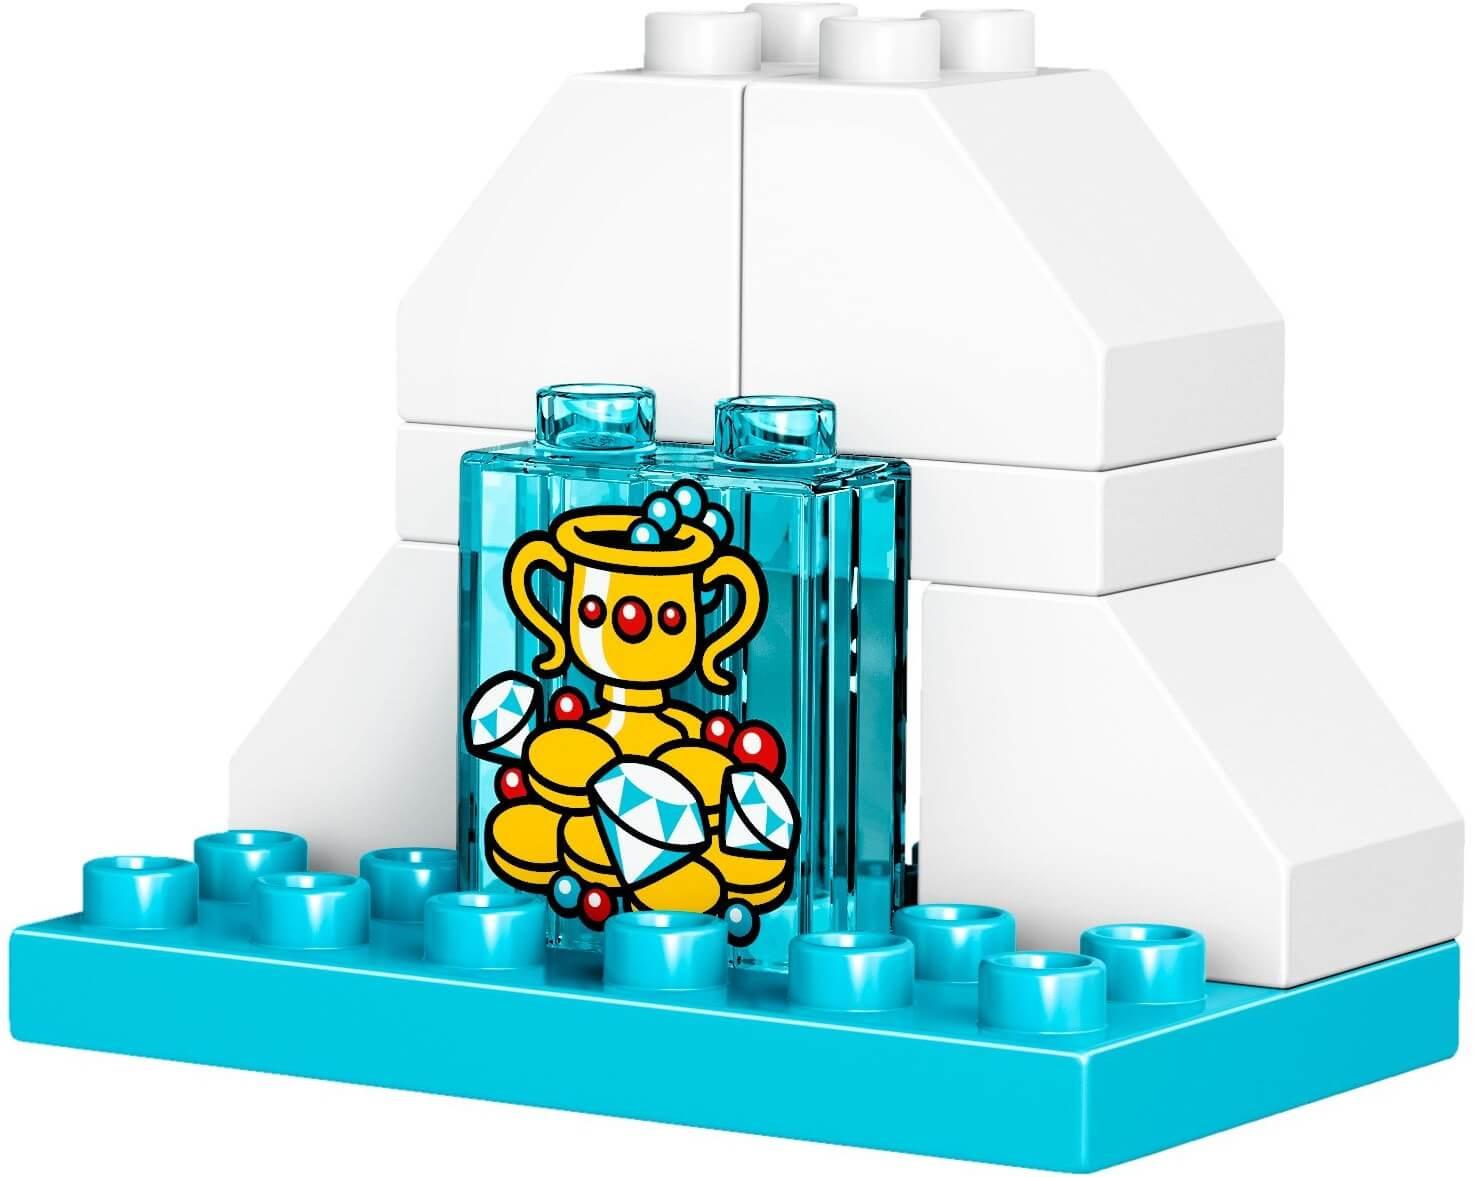 Mua đồ chơi LEGO 10823 - LEGO DUPLO 10823 - Cuộc Phiêu Lưu của Batman (LEGO 10823 Batwing Adventure)